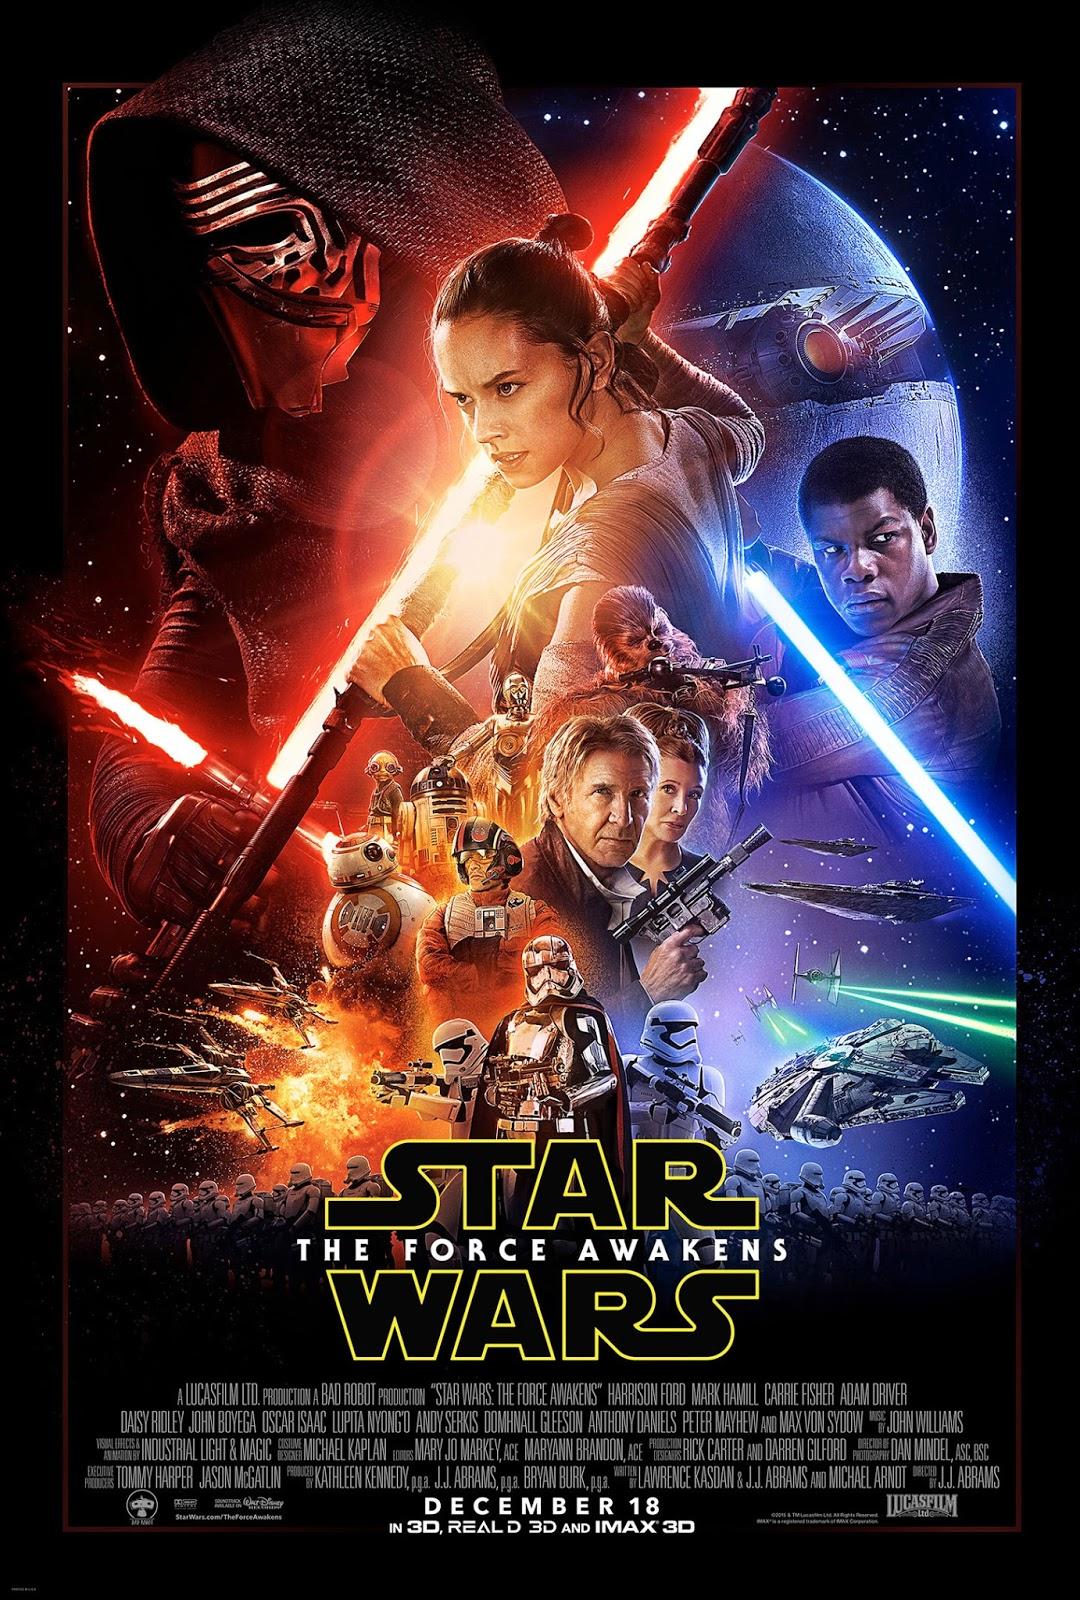 star wars the force awakens new poster teasers for trailer 3. Black Bedroom Furniture Sets. Home Design Ideas